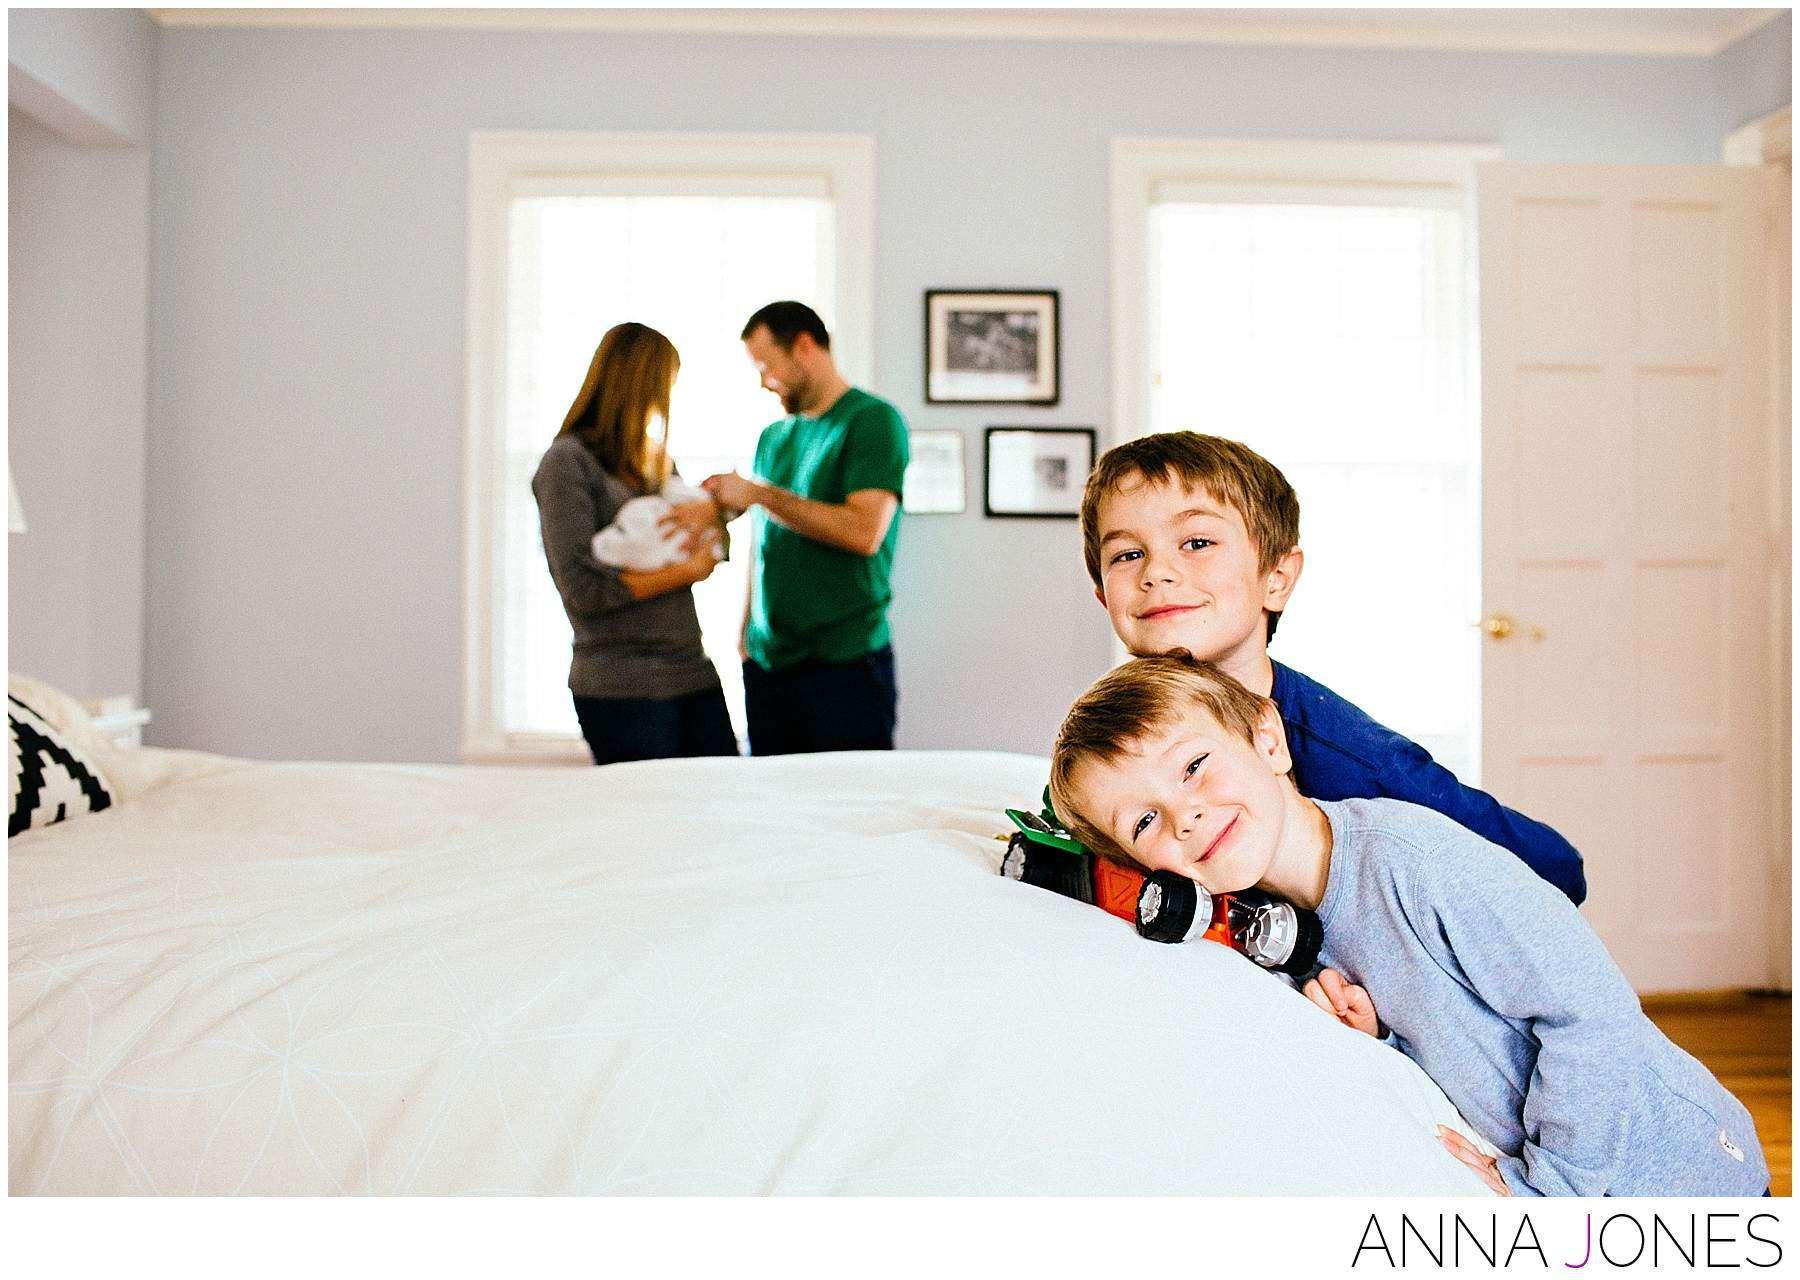 By Anna Jones. Wedding, Lifestyle, and Travel Photographer.